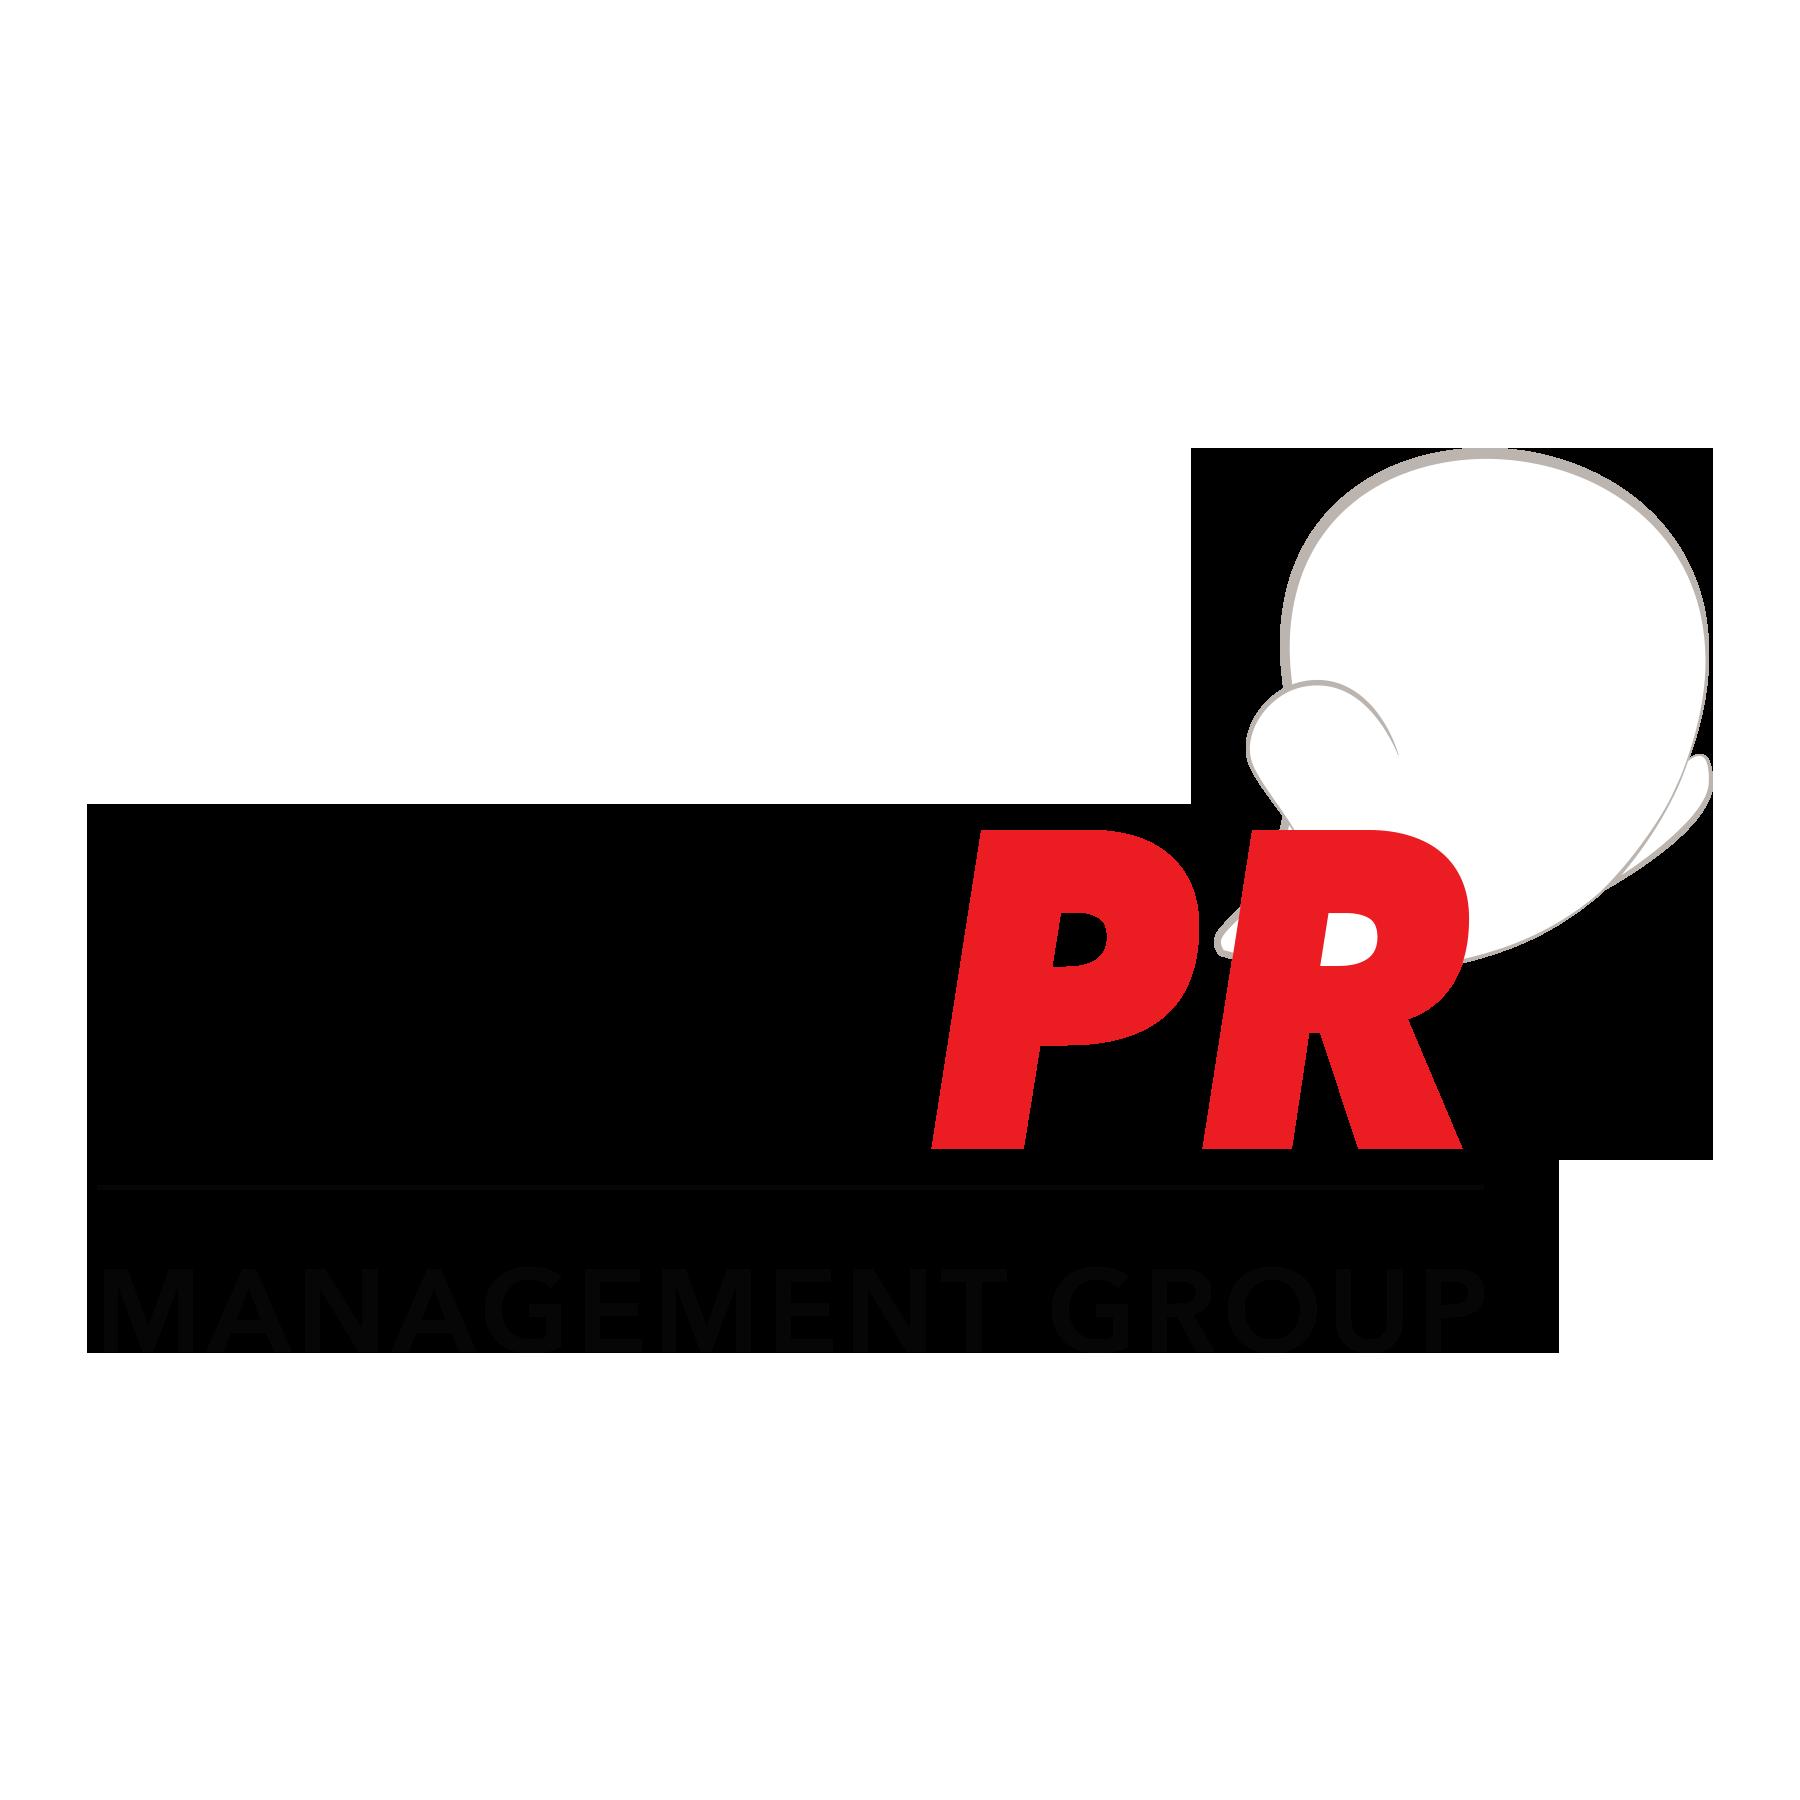 KasPR - MGMT Group